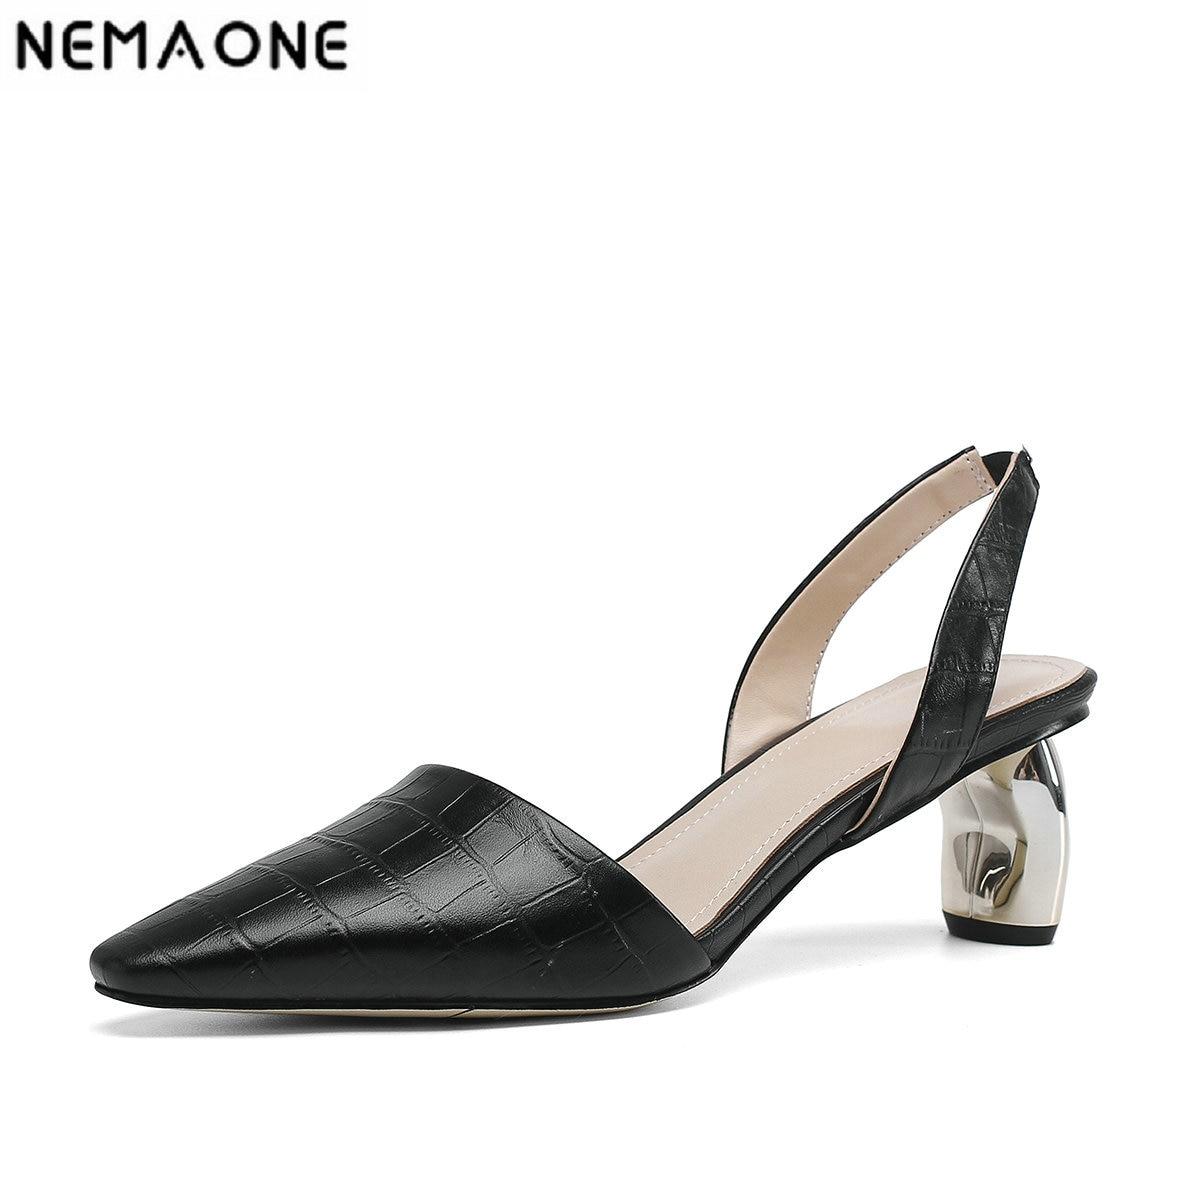 NEMAONE Elegant Women High Heels Spring Summer Genuine Leather Shoes Woman Pointed Toe Office Pumps Ladies